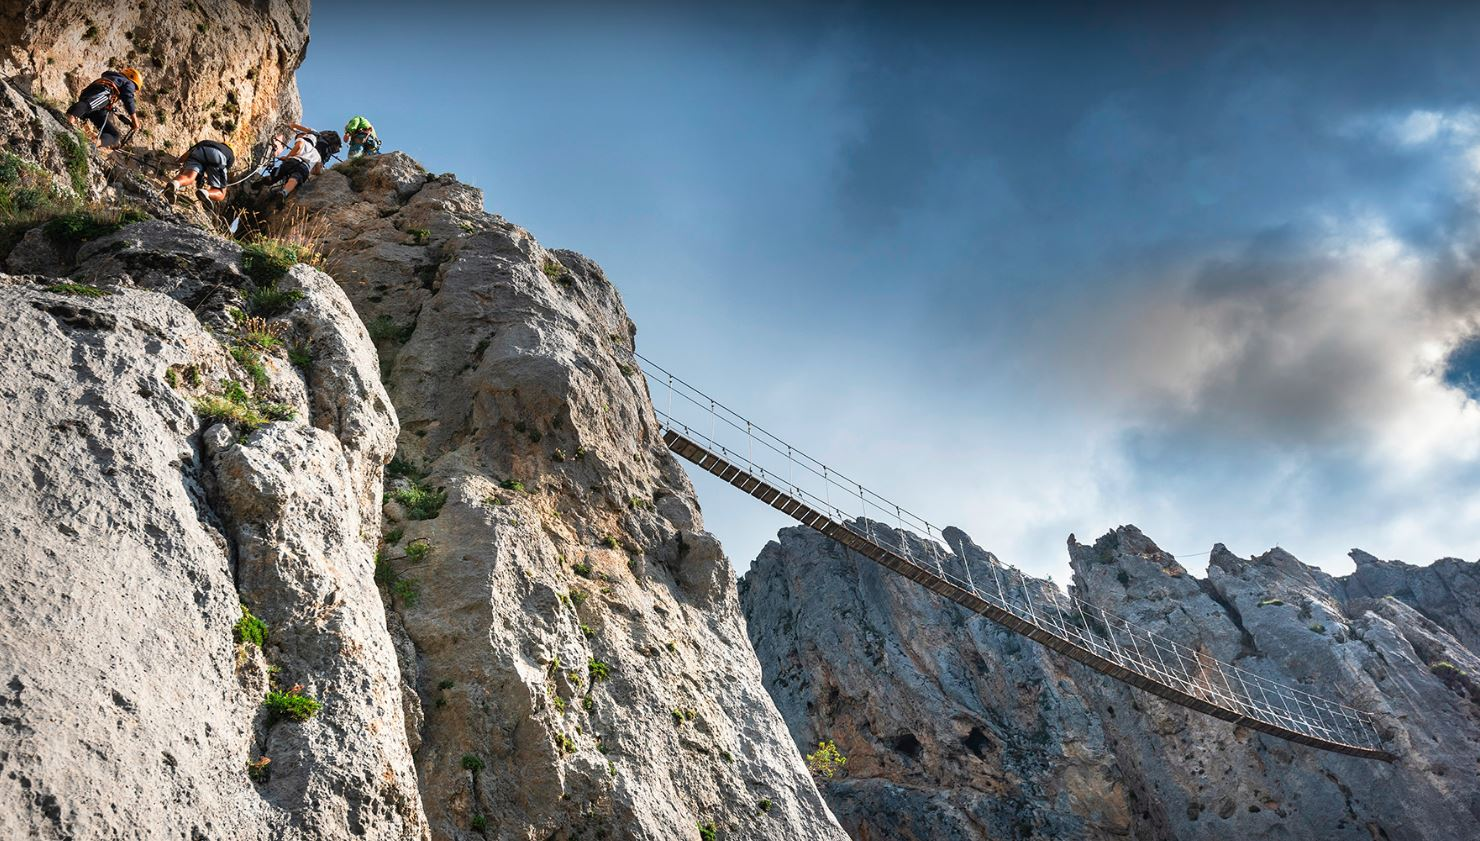 Via Ferrata de La Colmiane Passerelle Suspendue